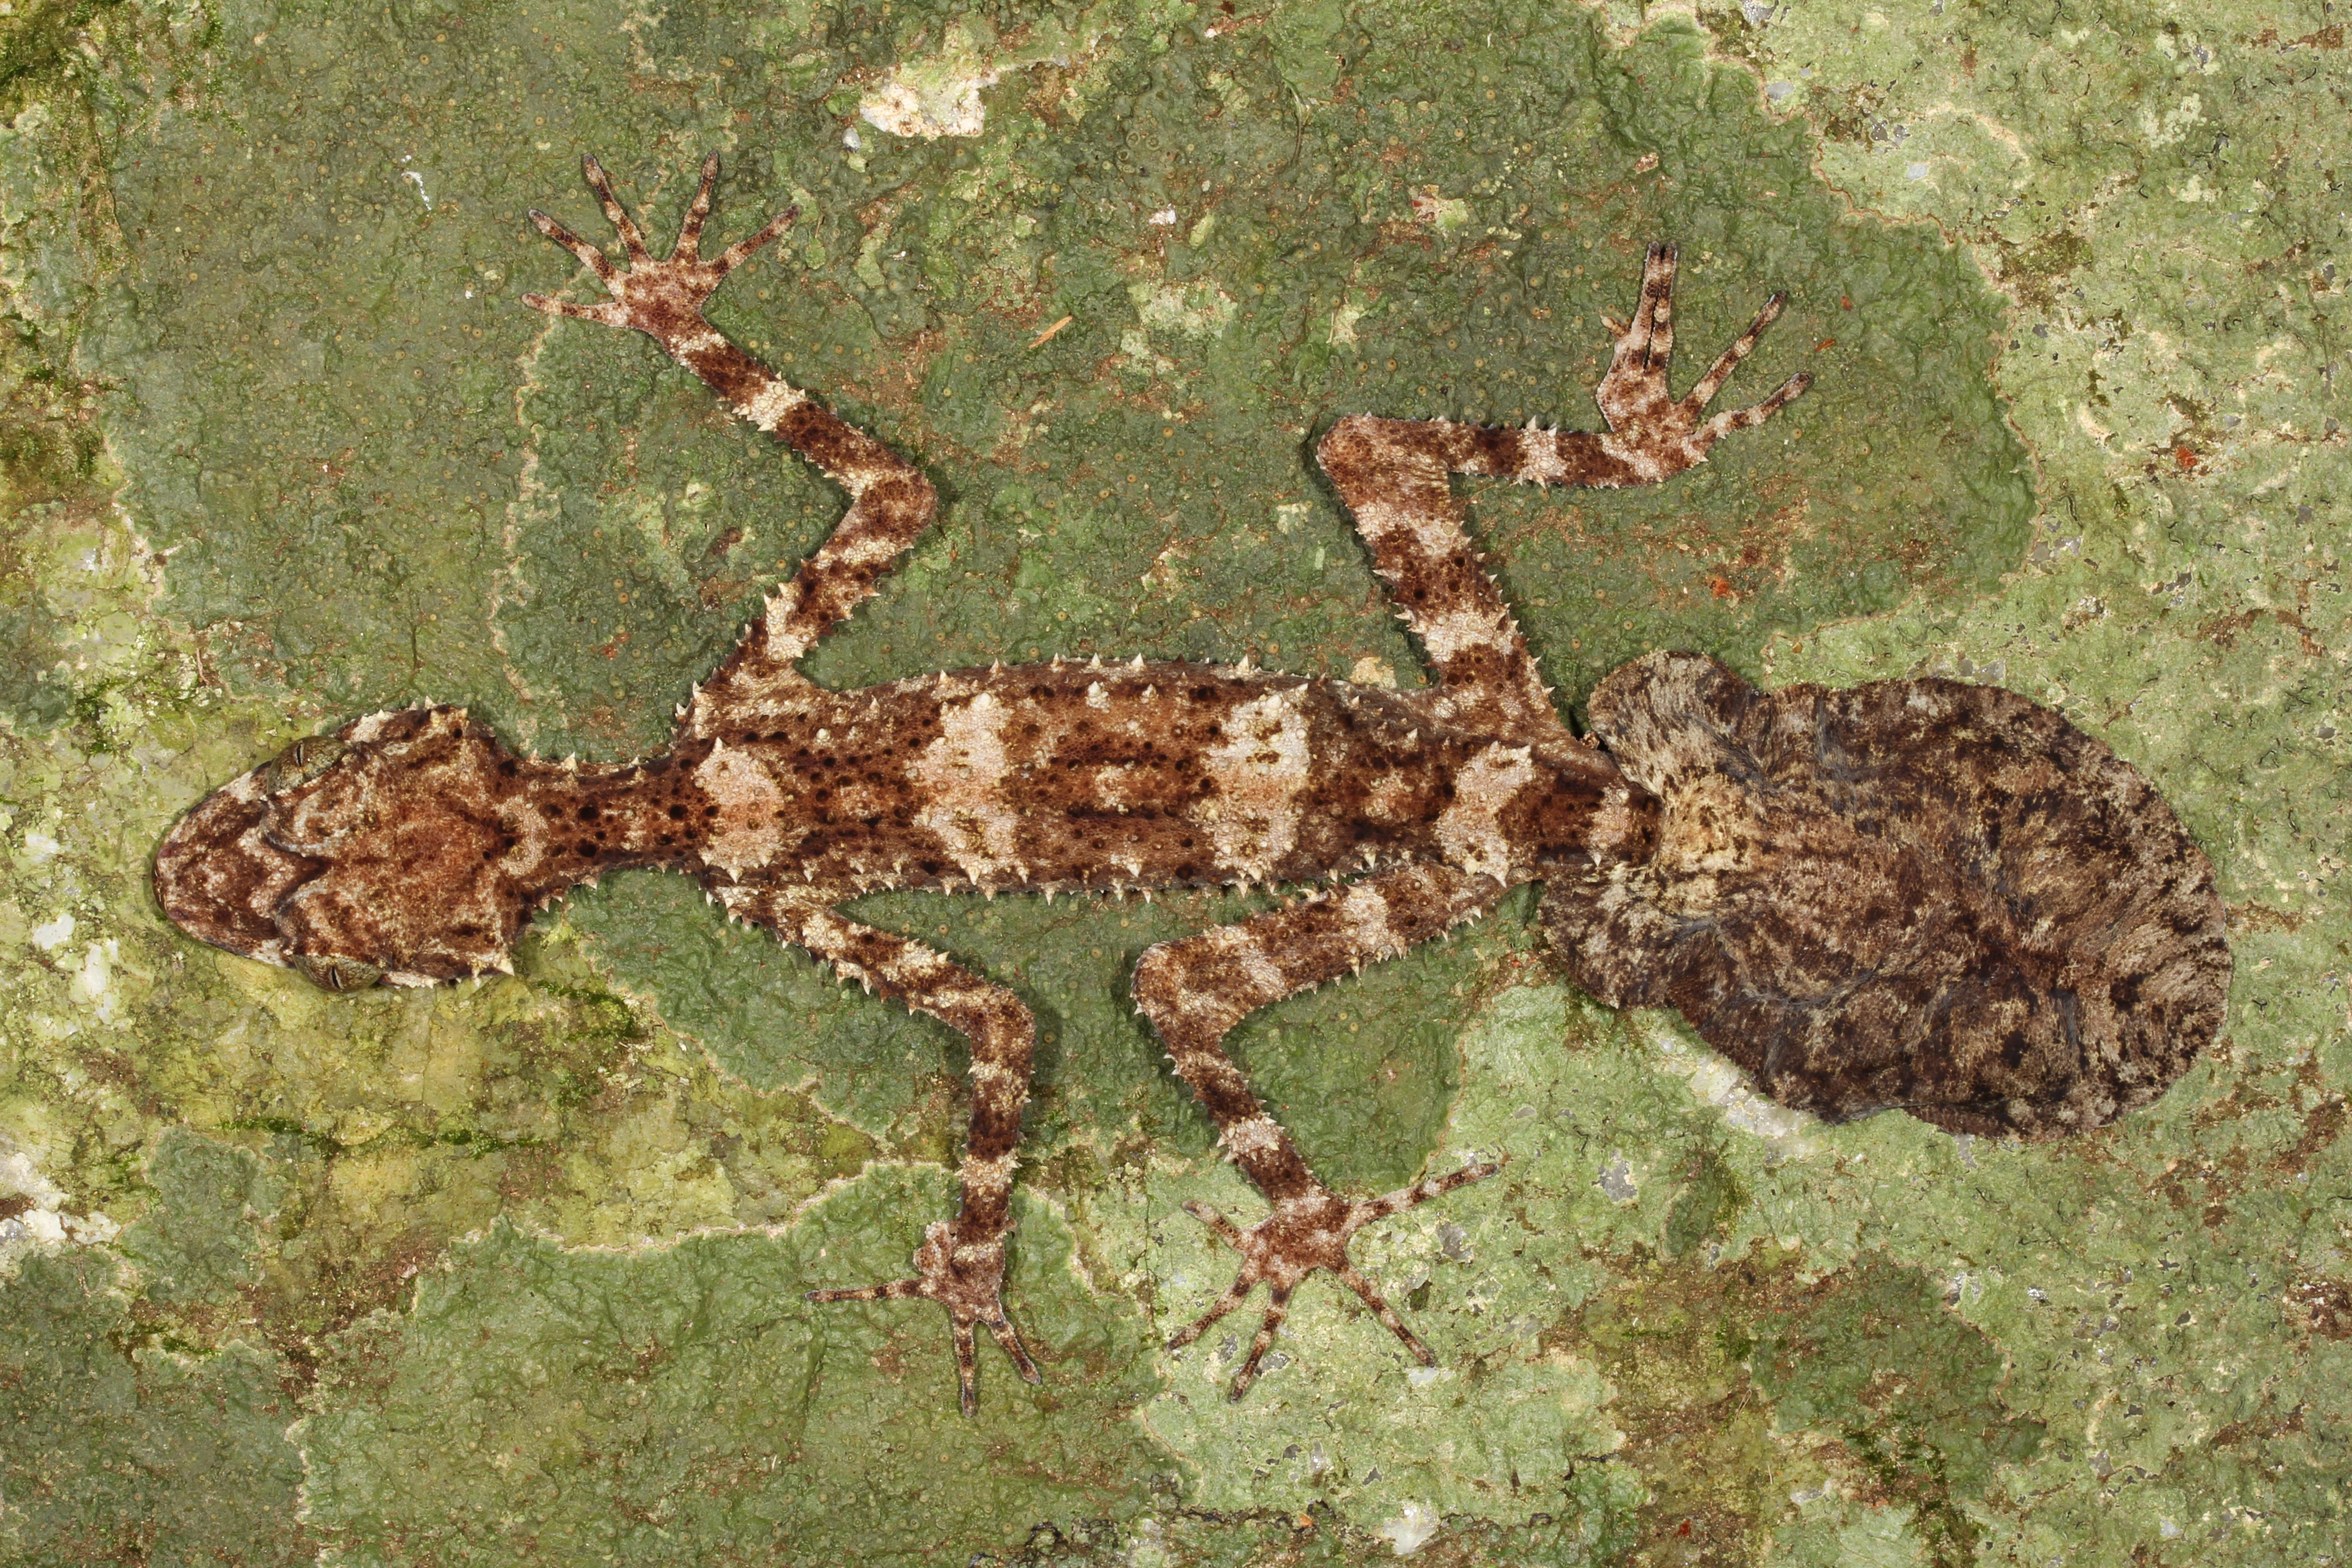 new leaftail gecko_Conrad Hoskin_9